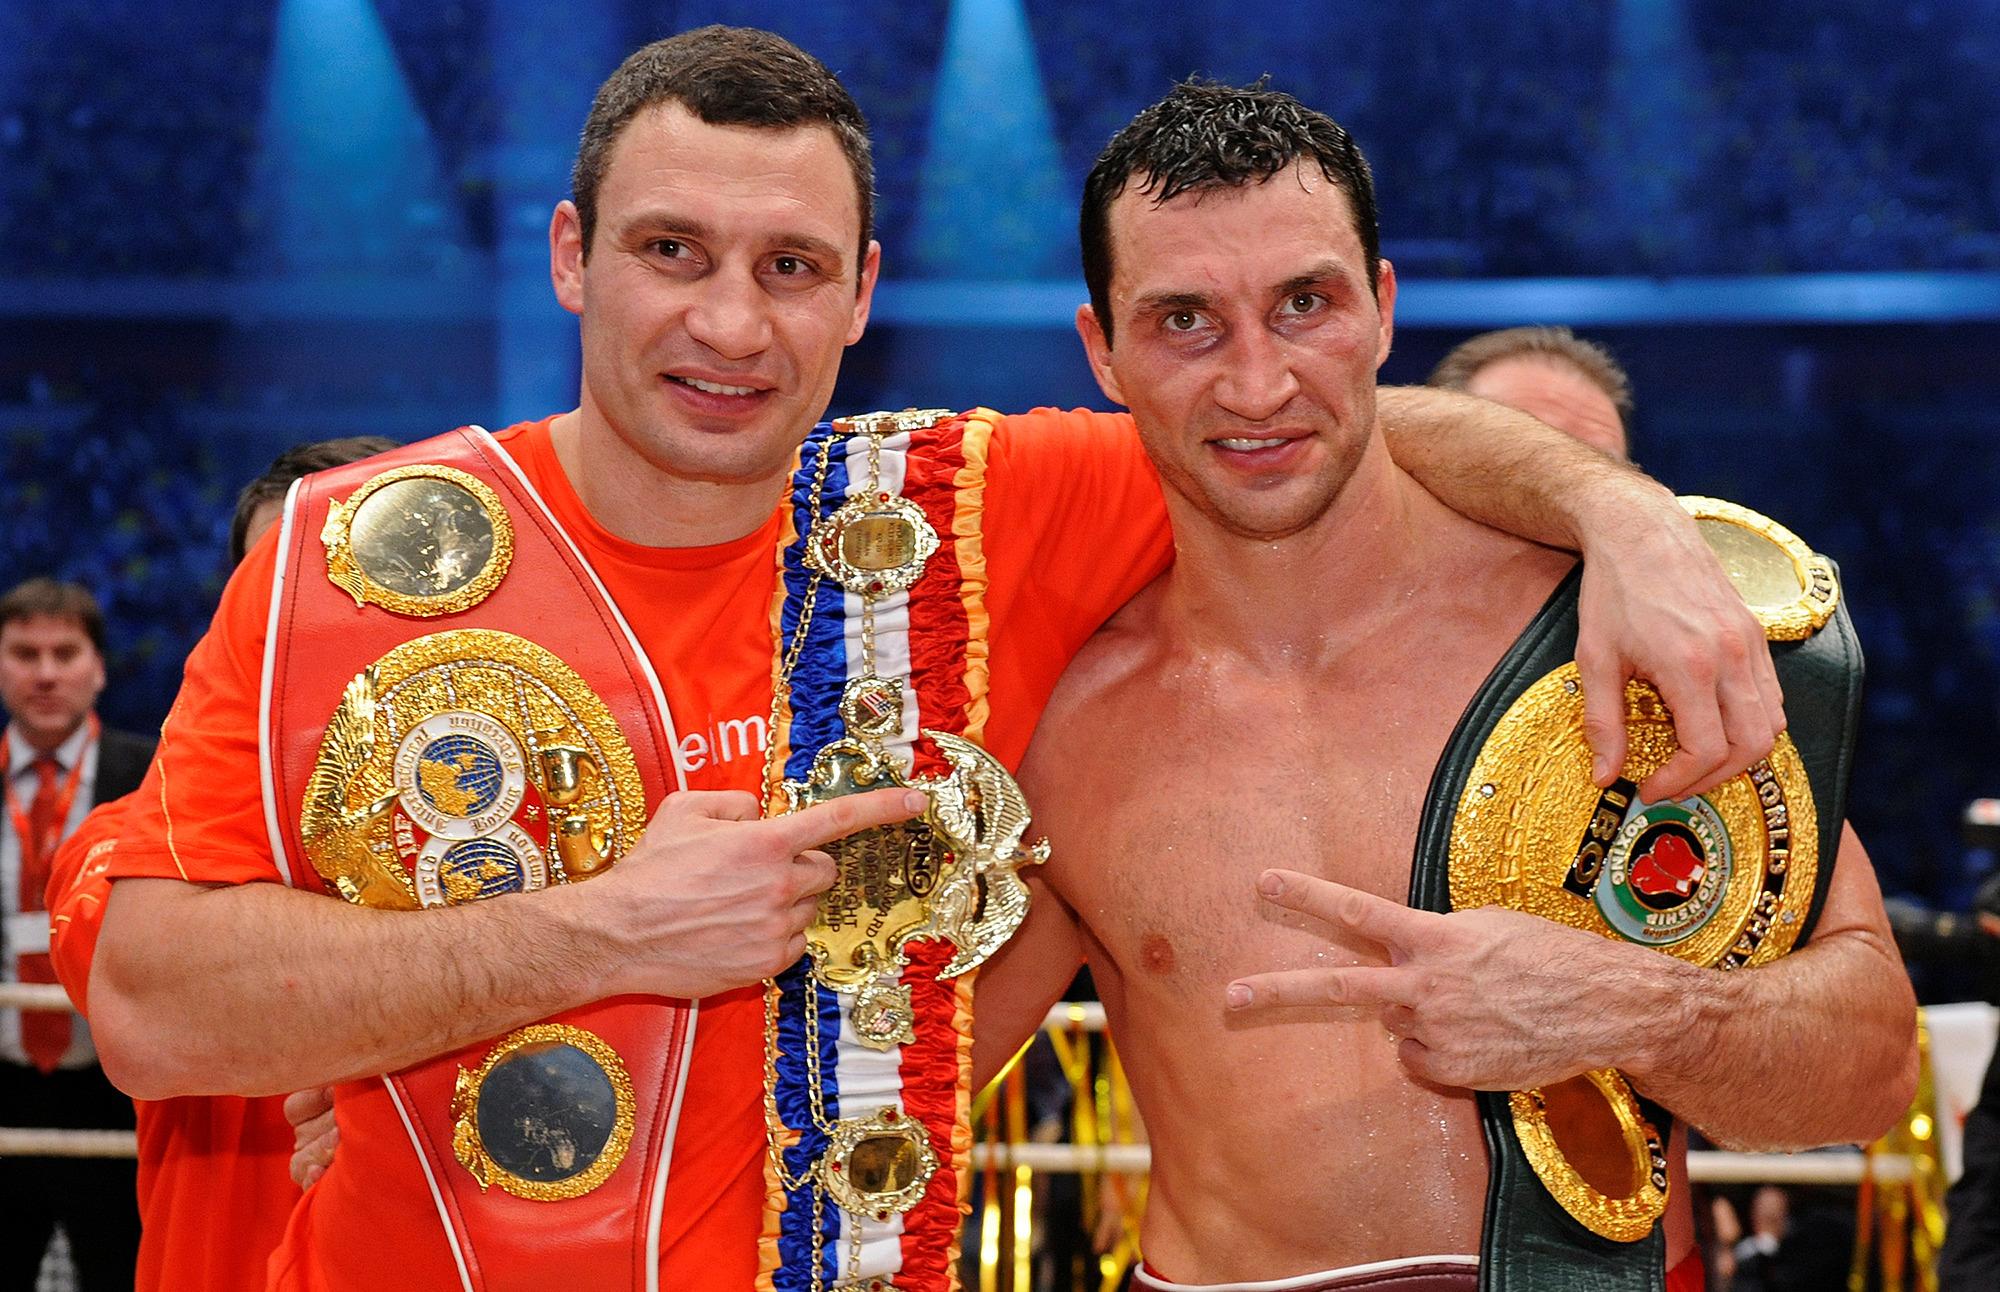 Wladimir Klitschko and Vitali Klitschko after defeating US Eddie Chambers in 2010 (Getty)